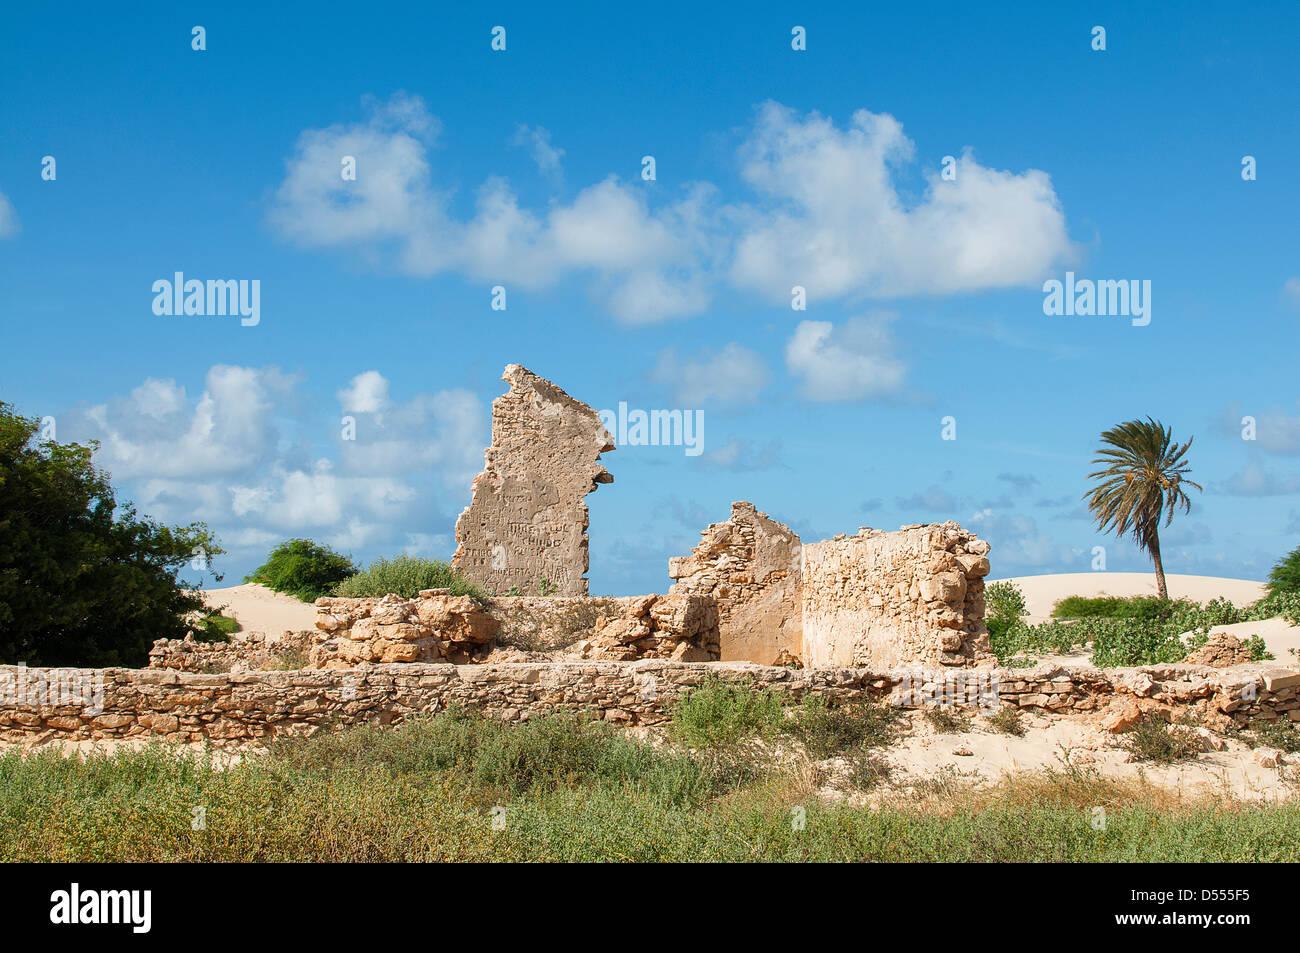 Stone ruins under blue sky - Stock Image